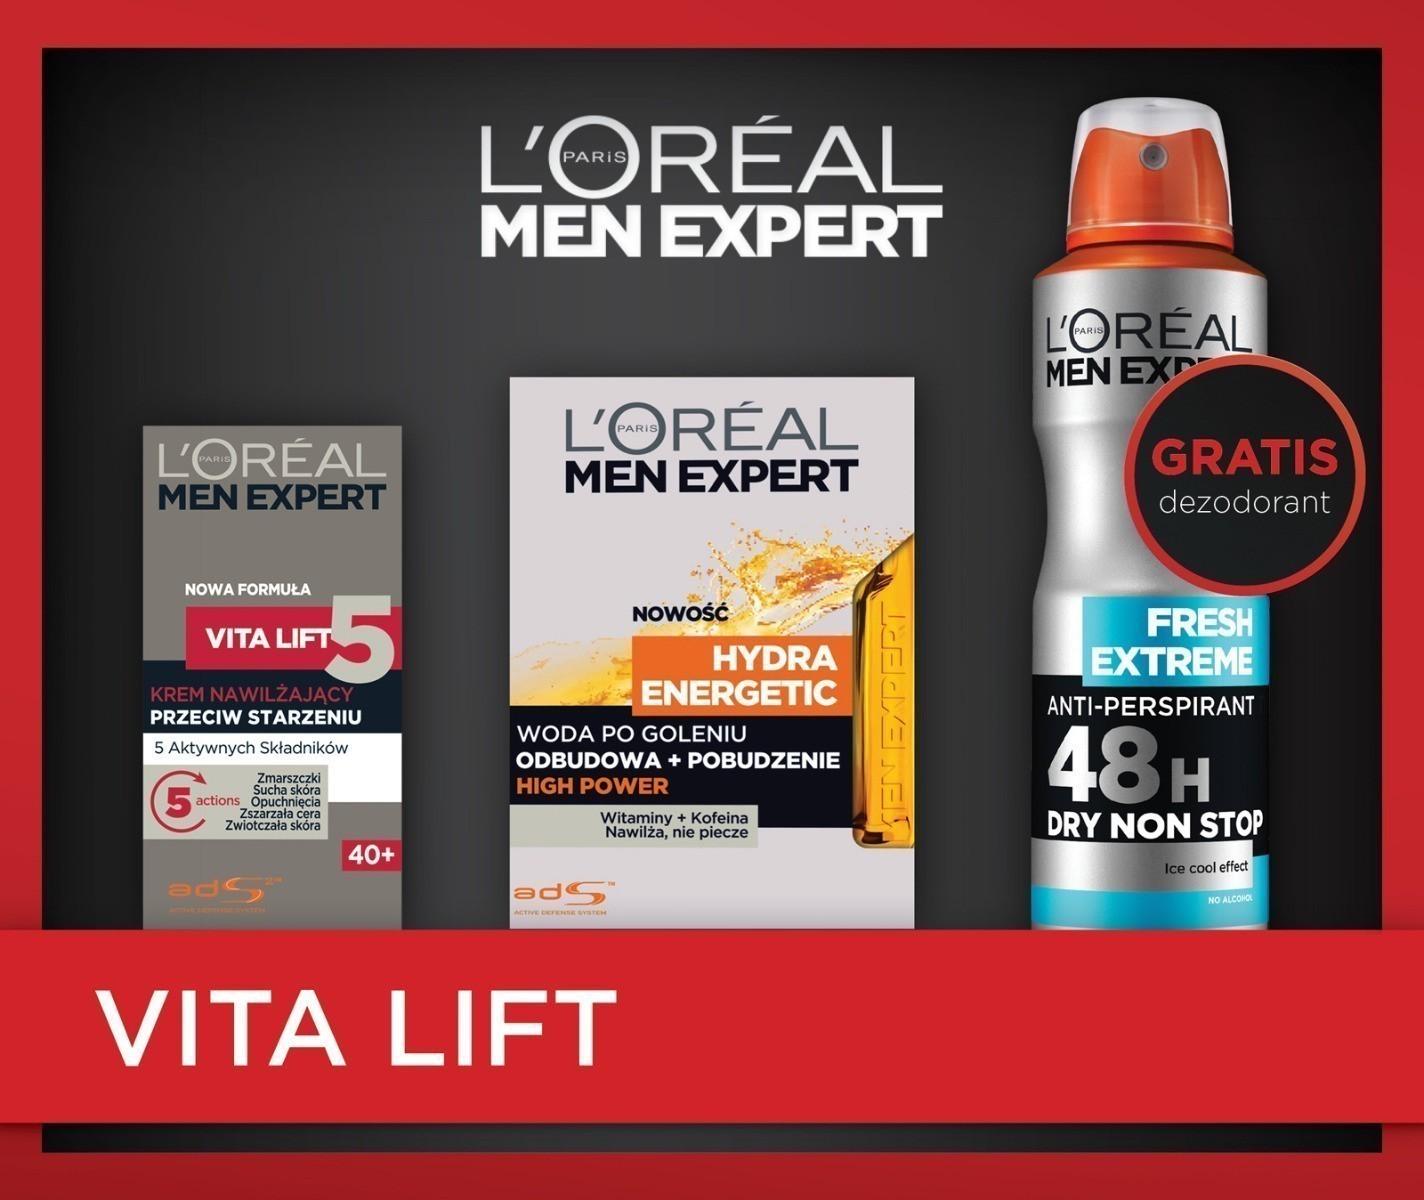 Loréal Men Expert Vita Lift XMASS